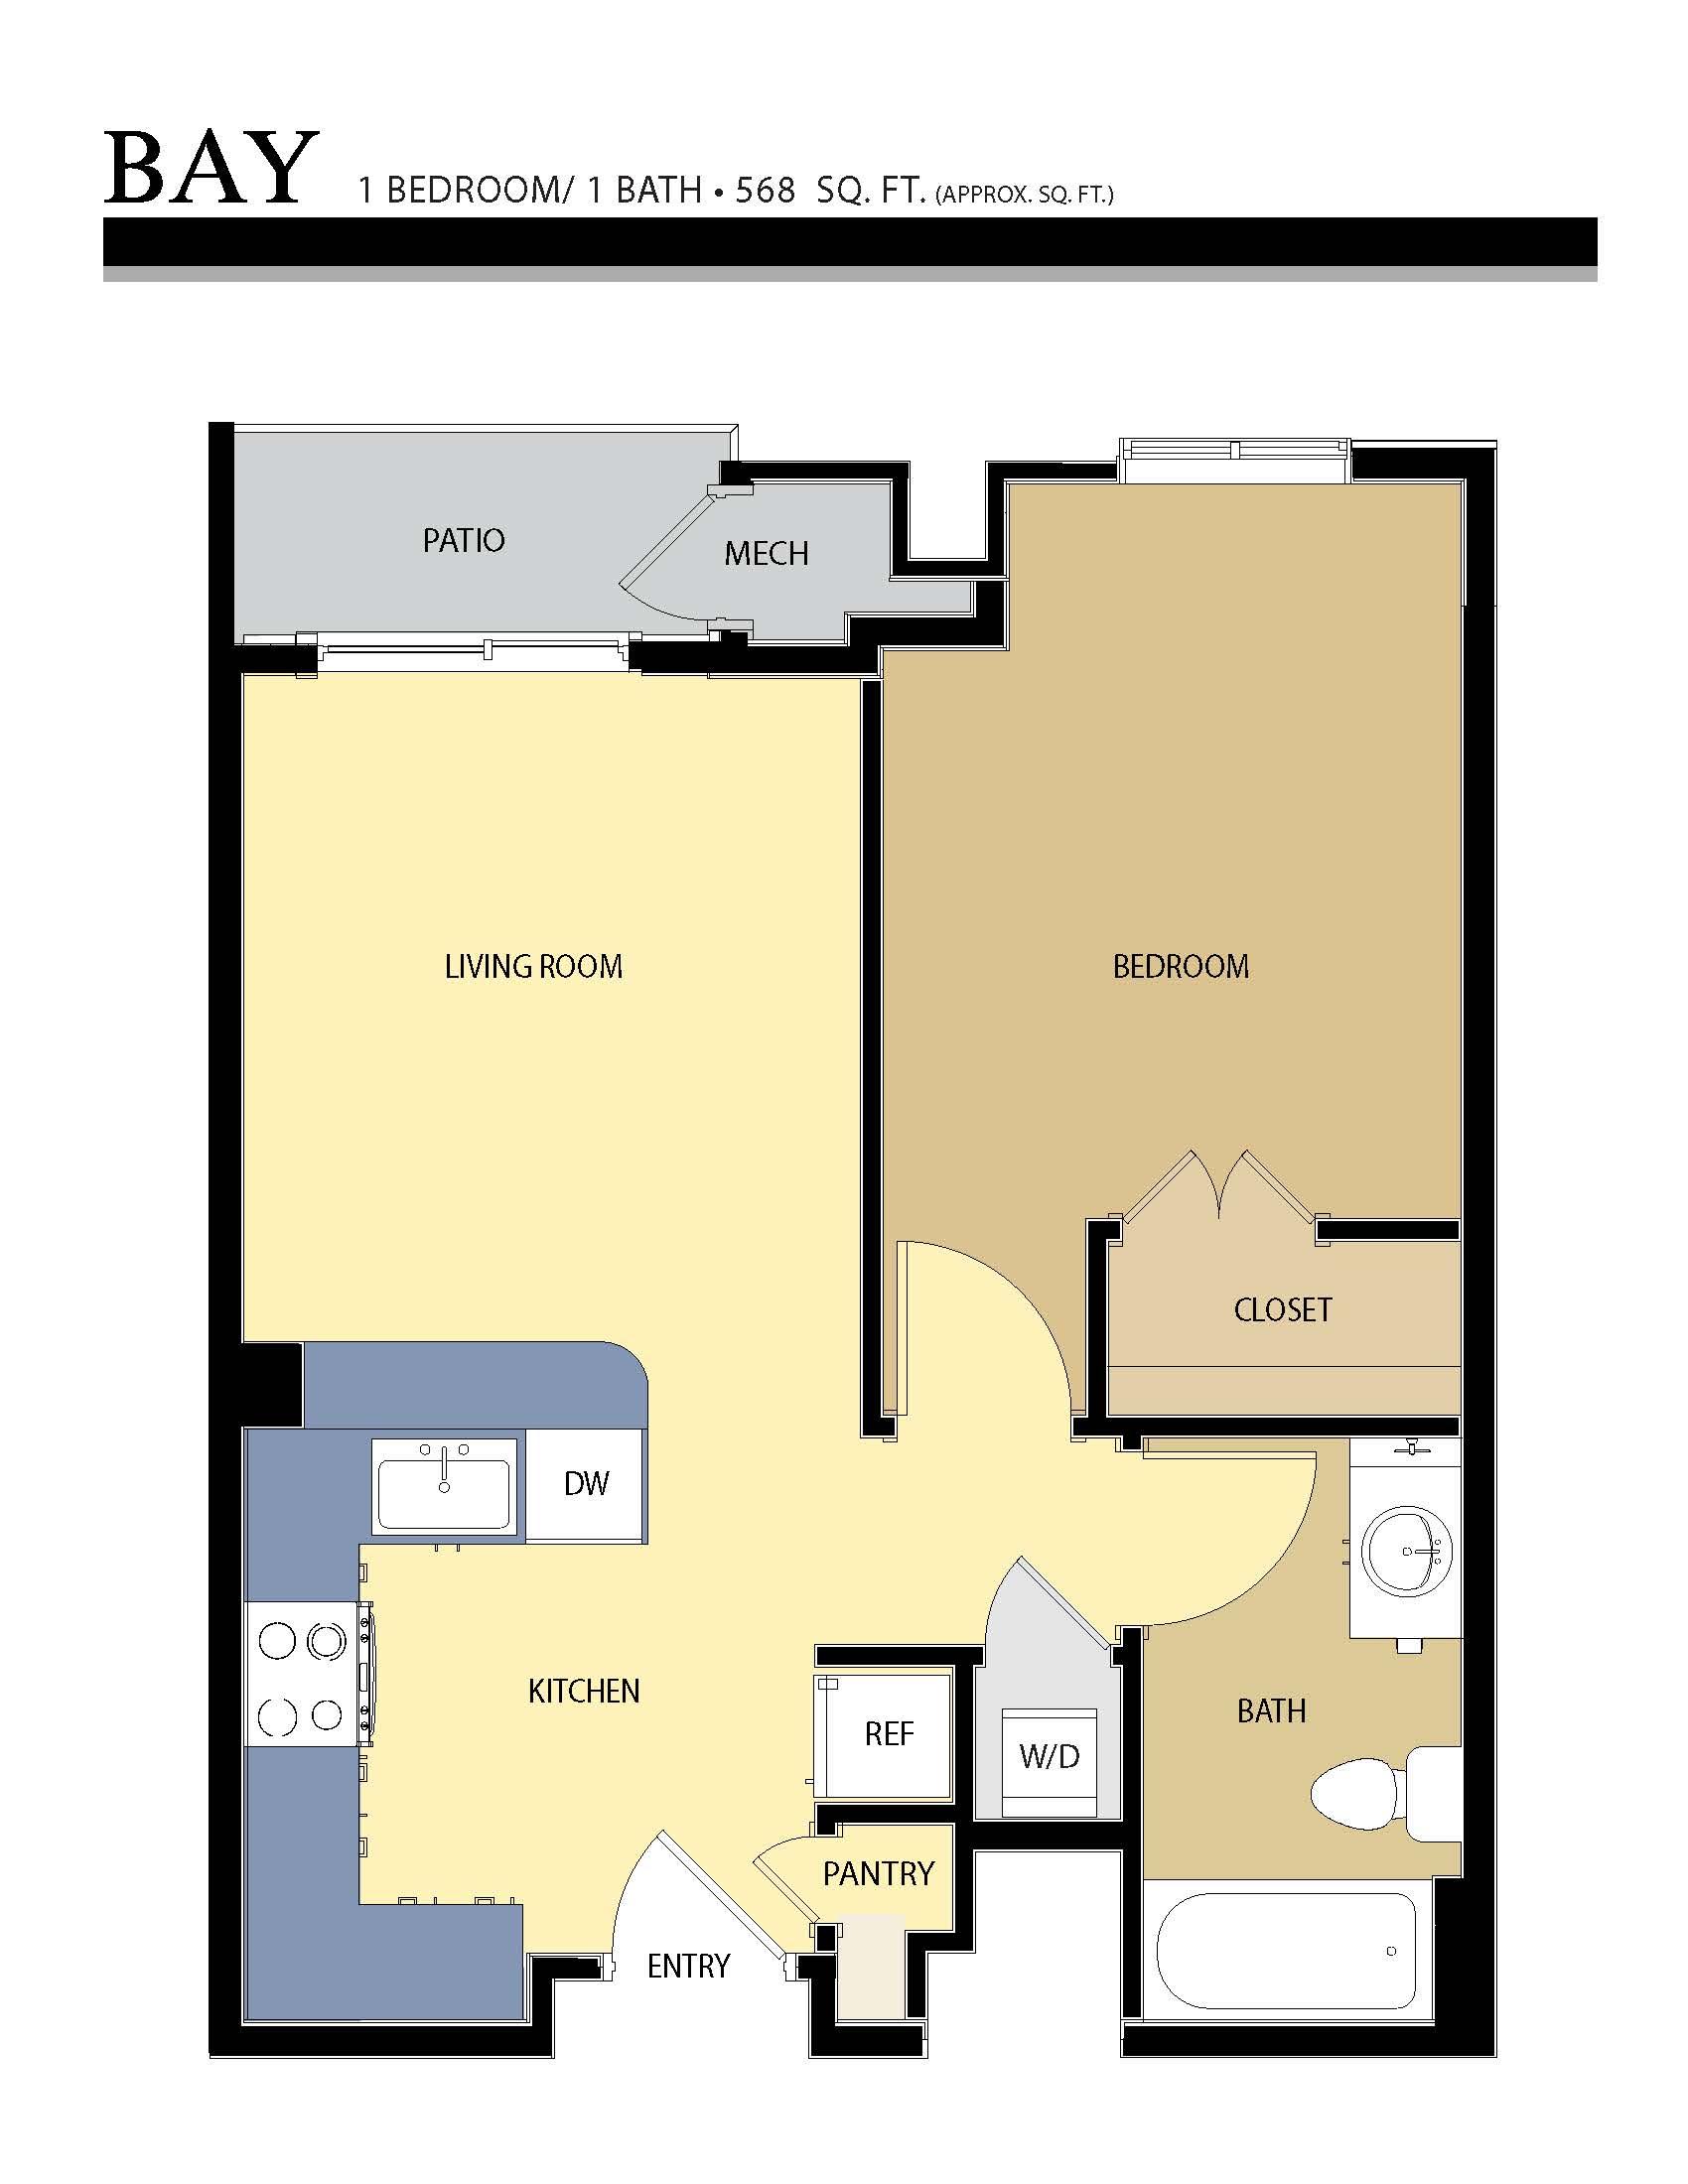 Endearing 25 1 Bedroom Floor Plans Inspiration Design Of